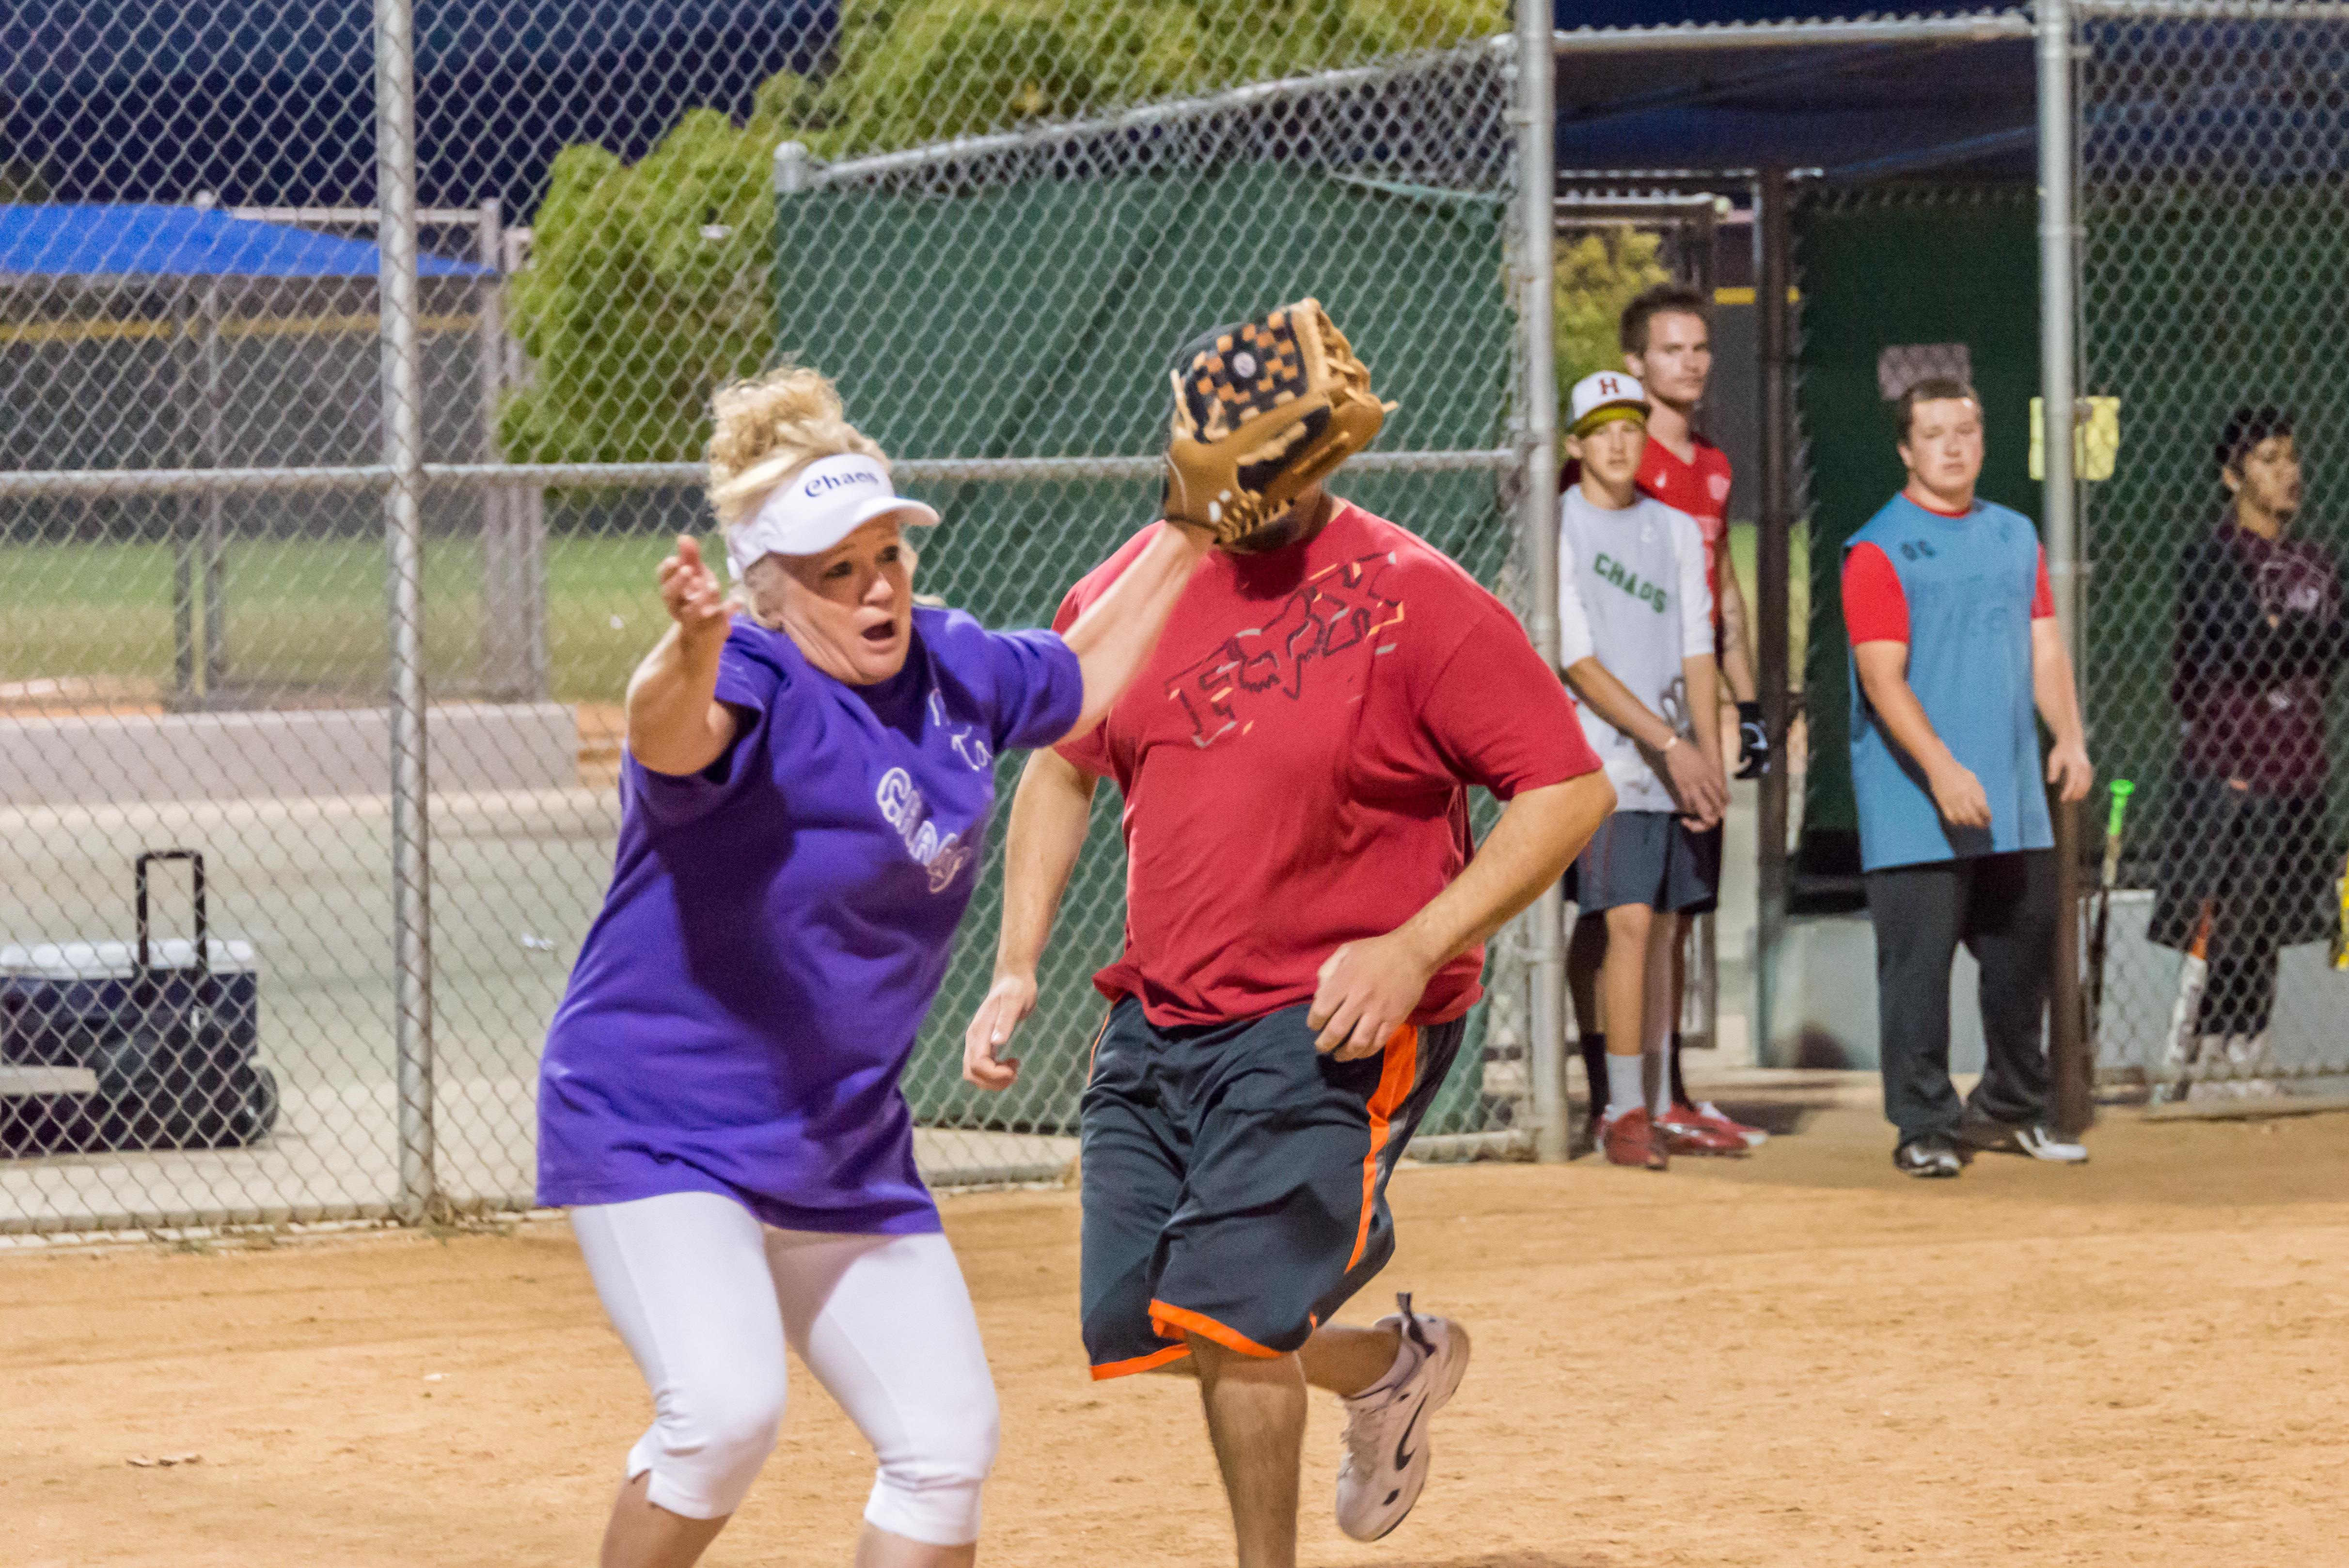 2015-06-11-baseballgame-012